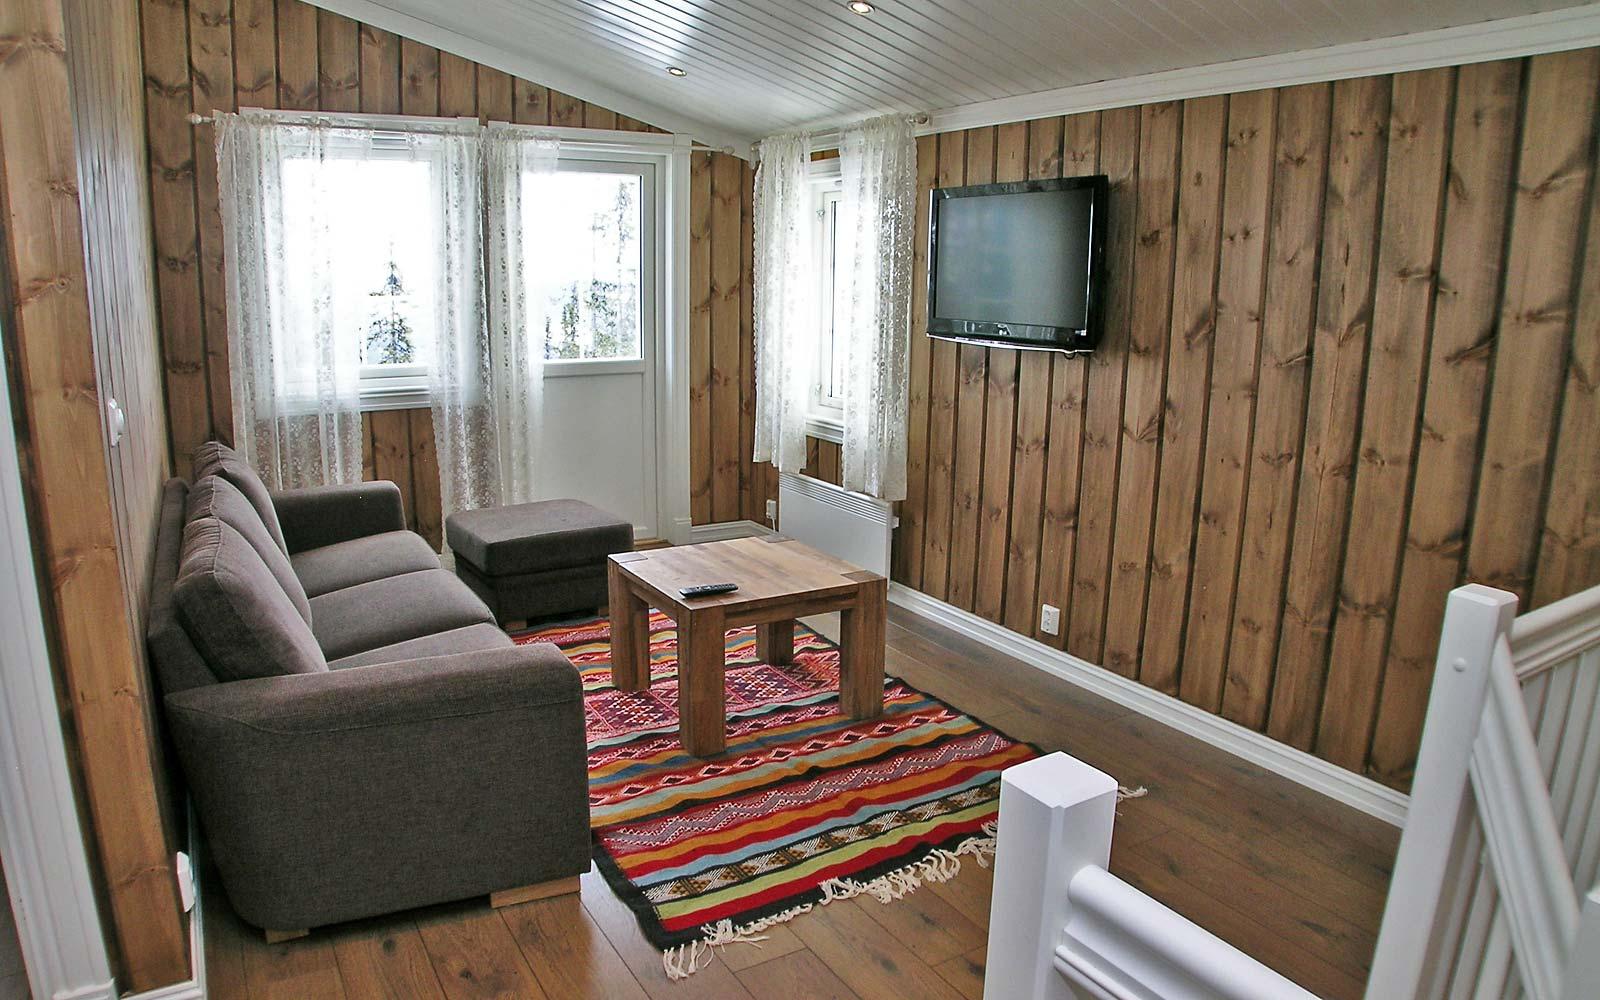 Loftstue Håvi-1 - Sjumilskogen booking Trysil